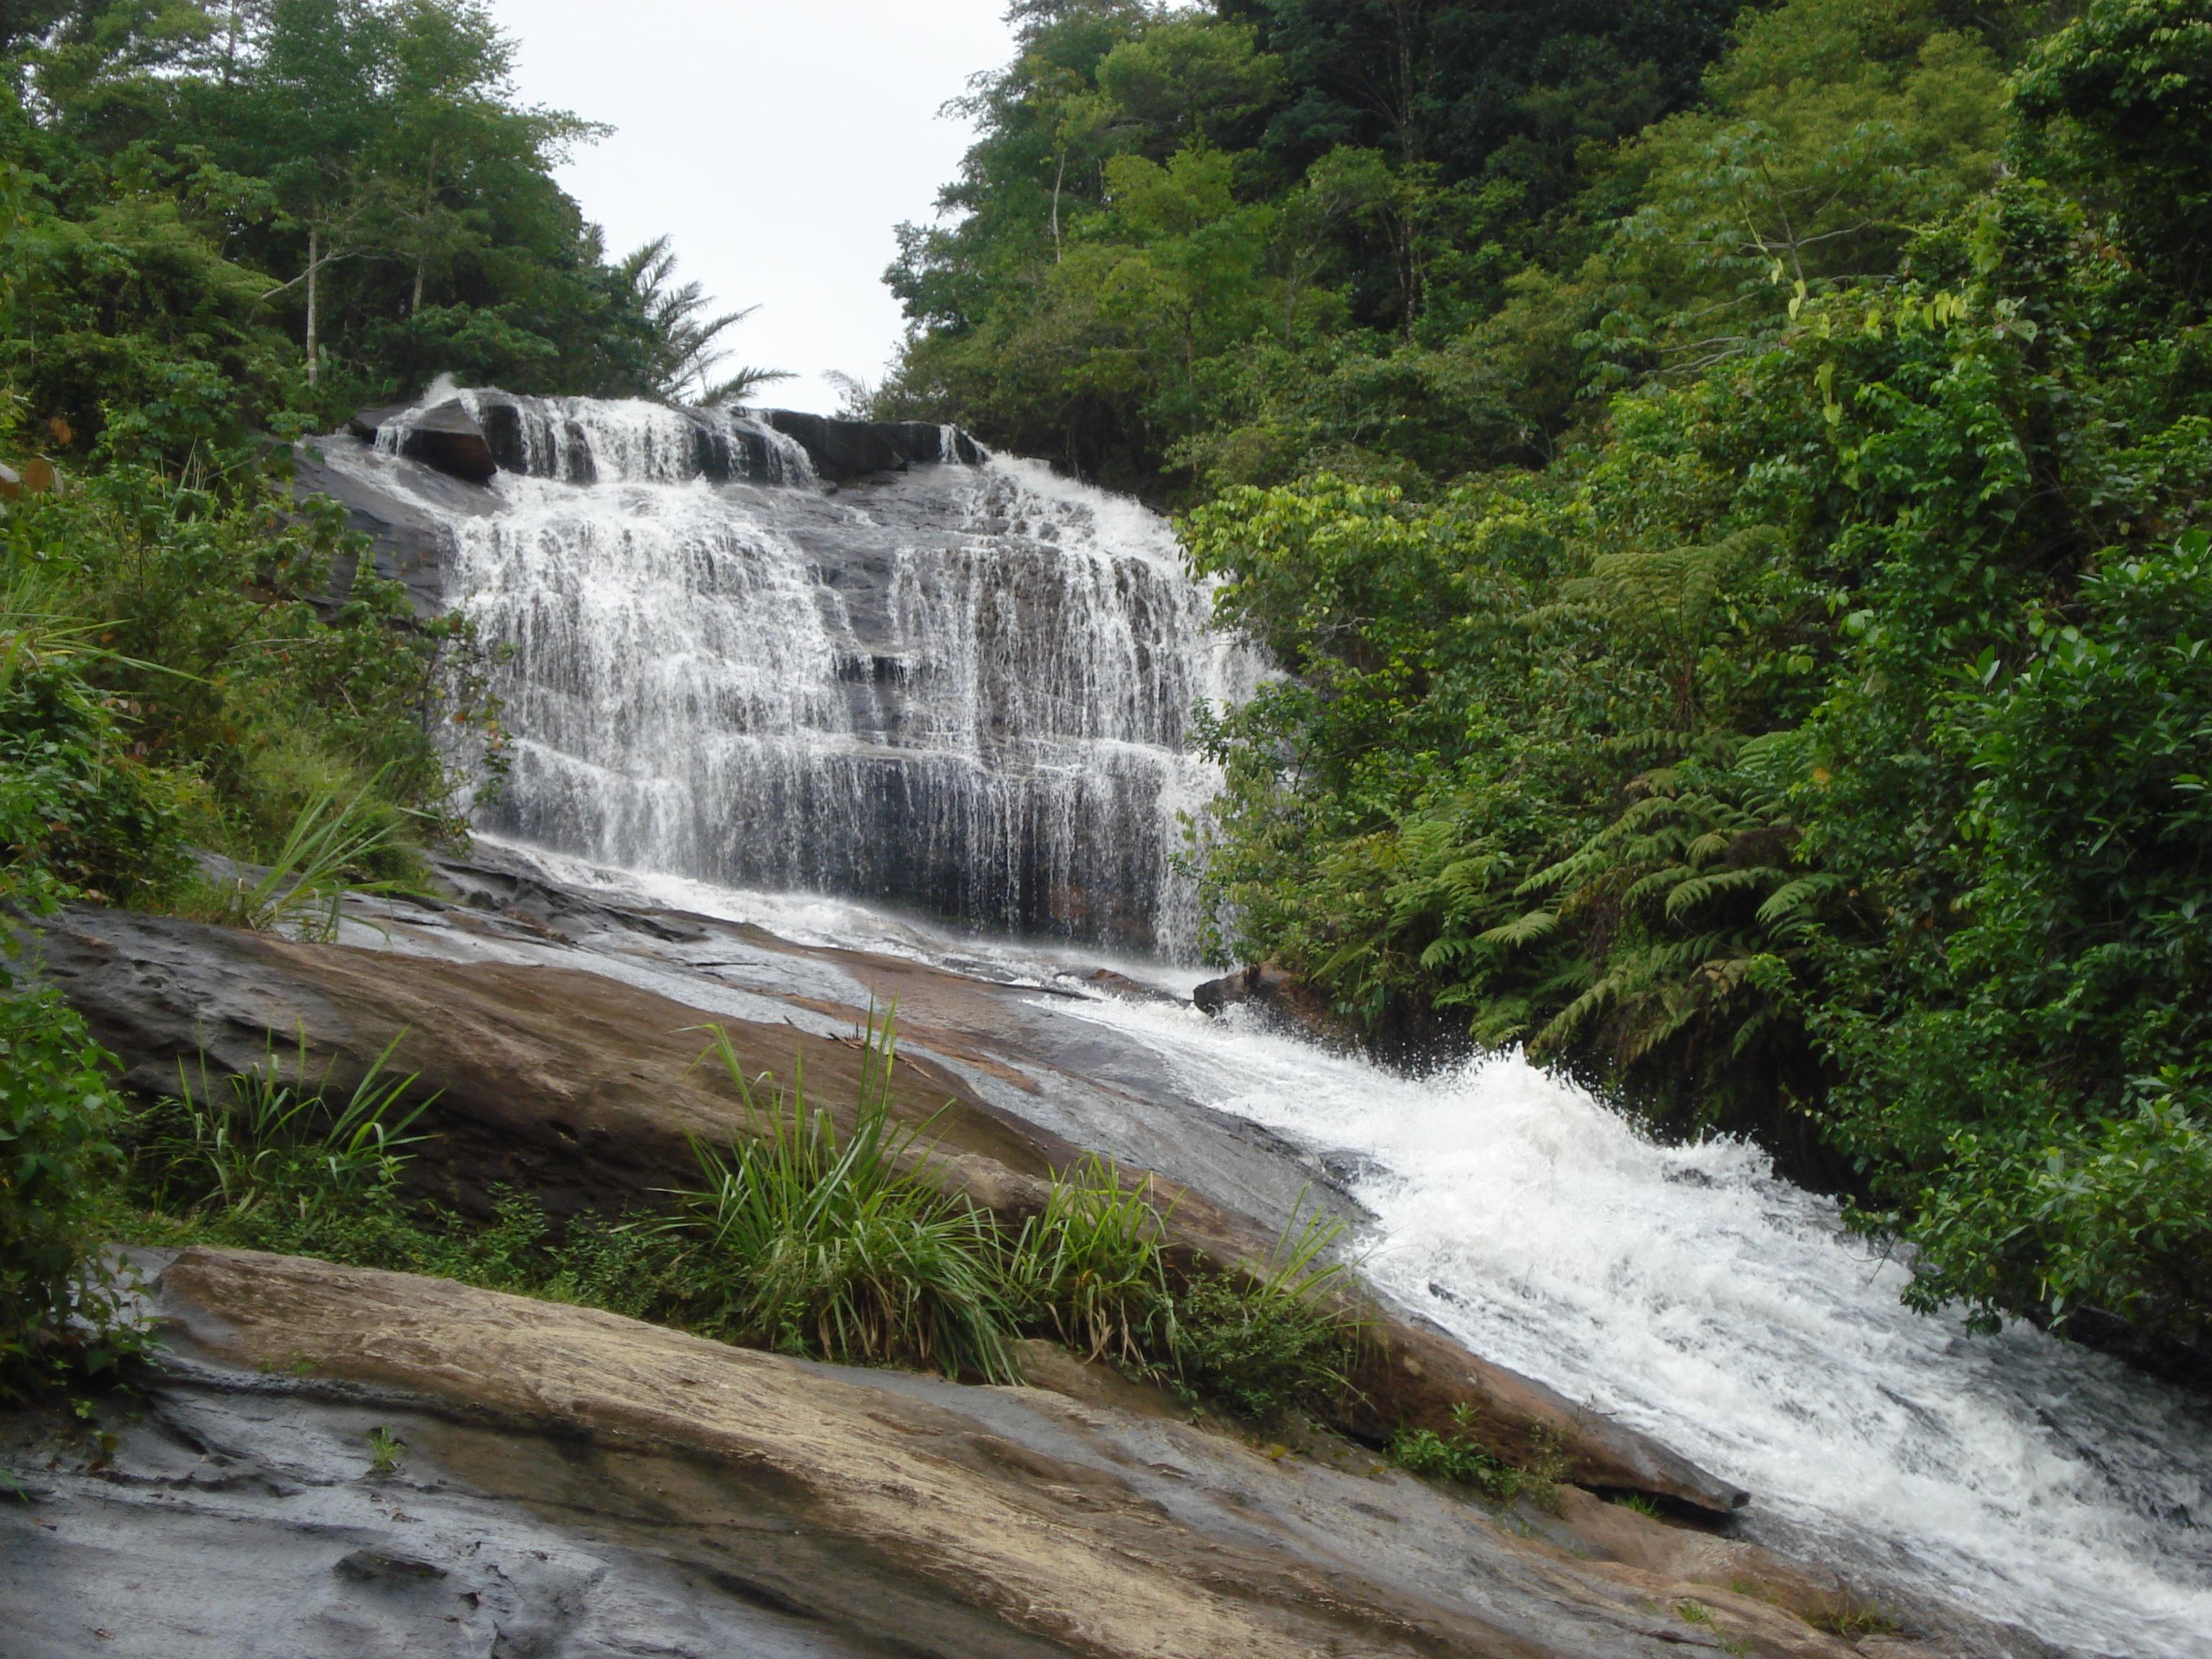 Bonito Pernambuco fonte: upload.wikimedia.org